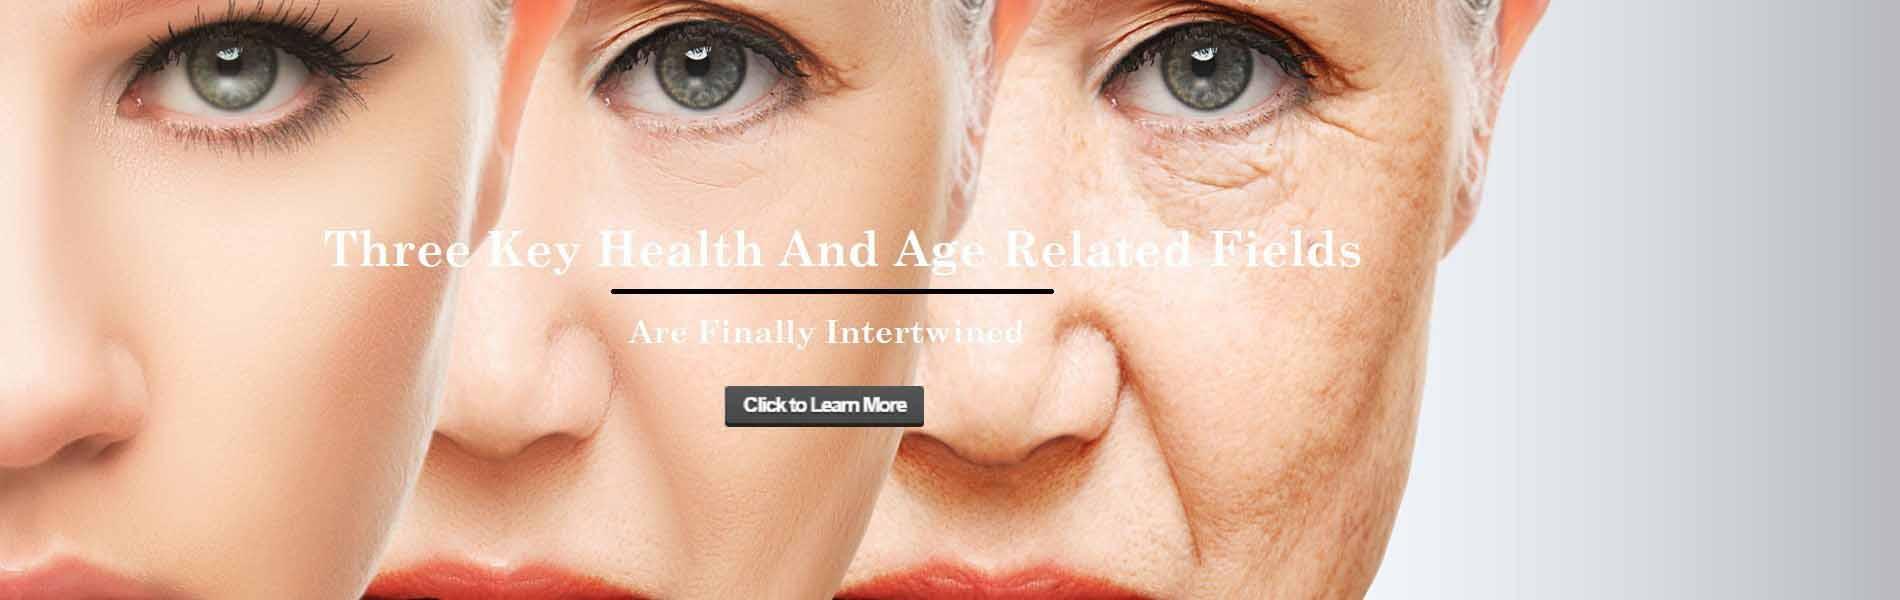 Anti-Aging Research